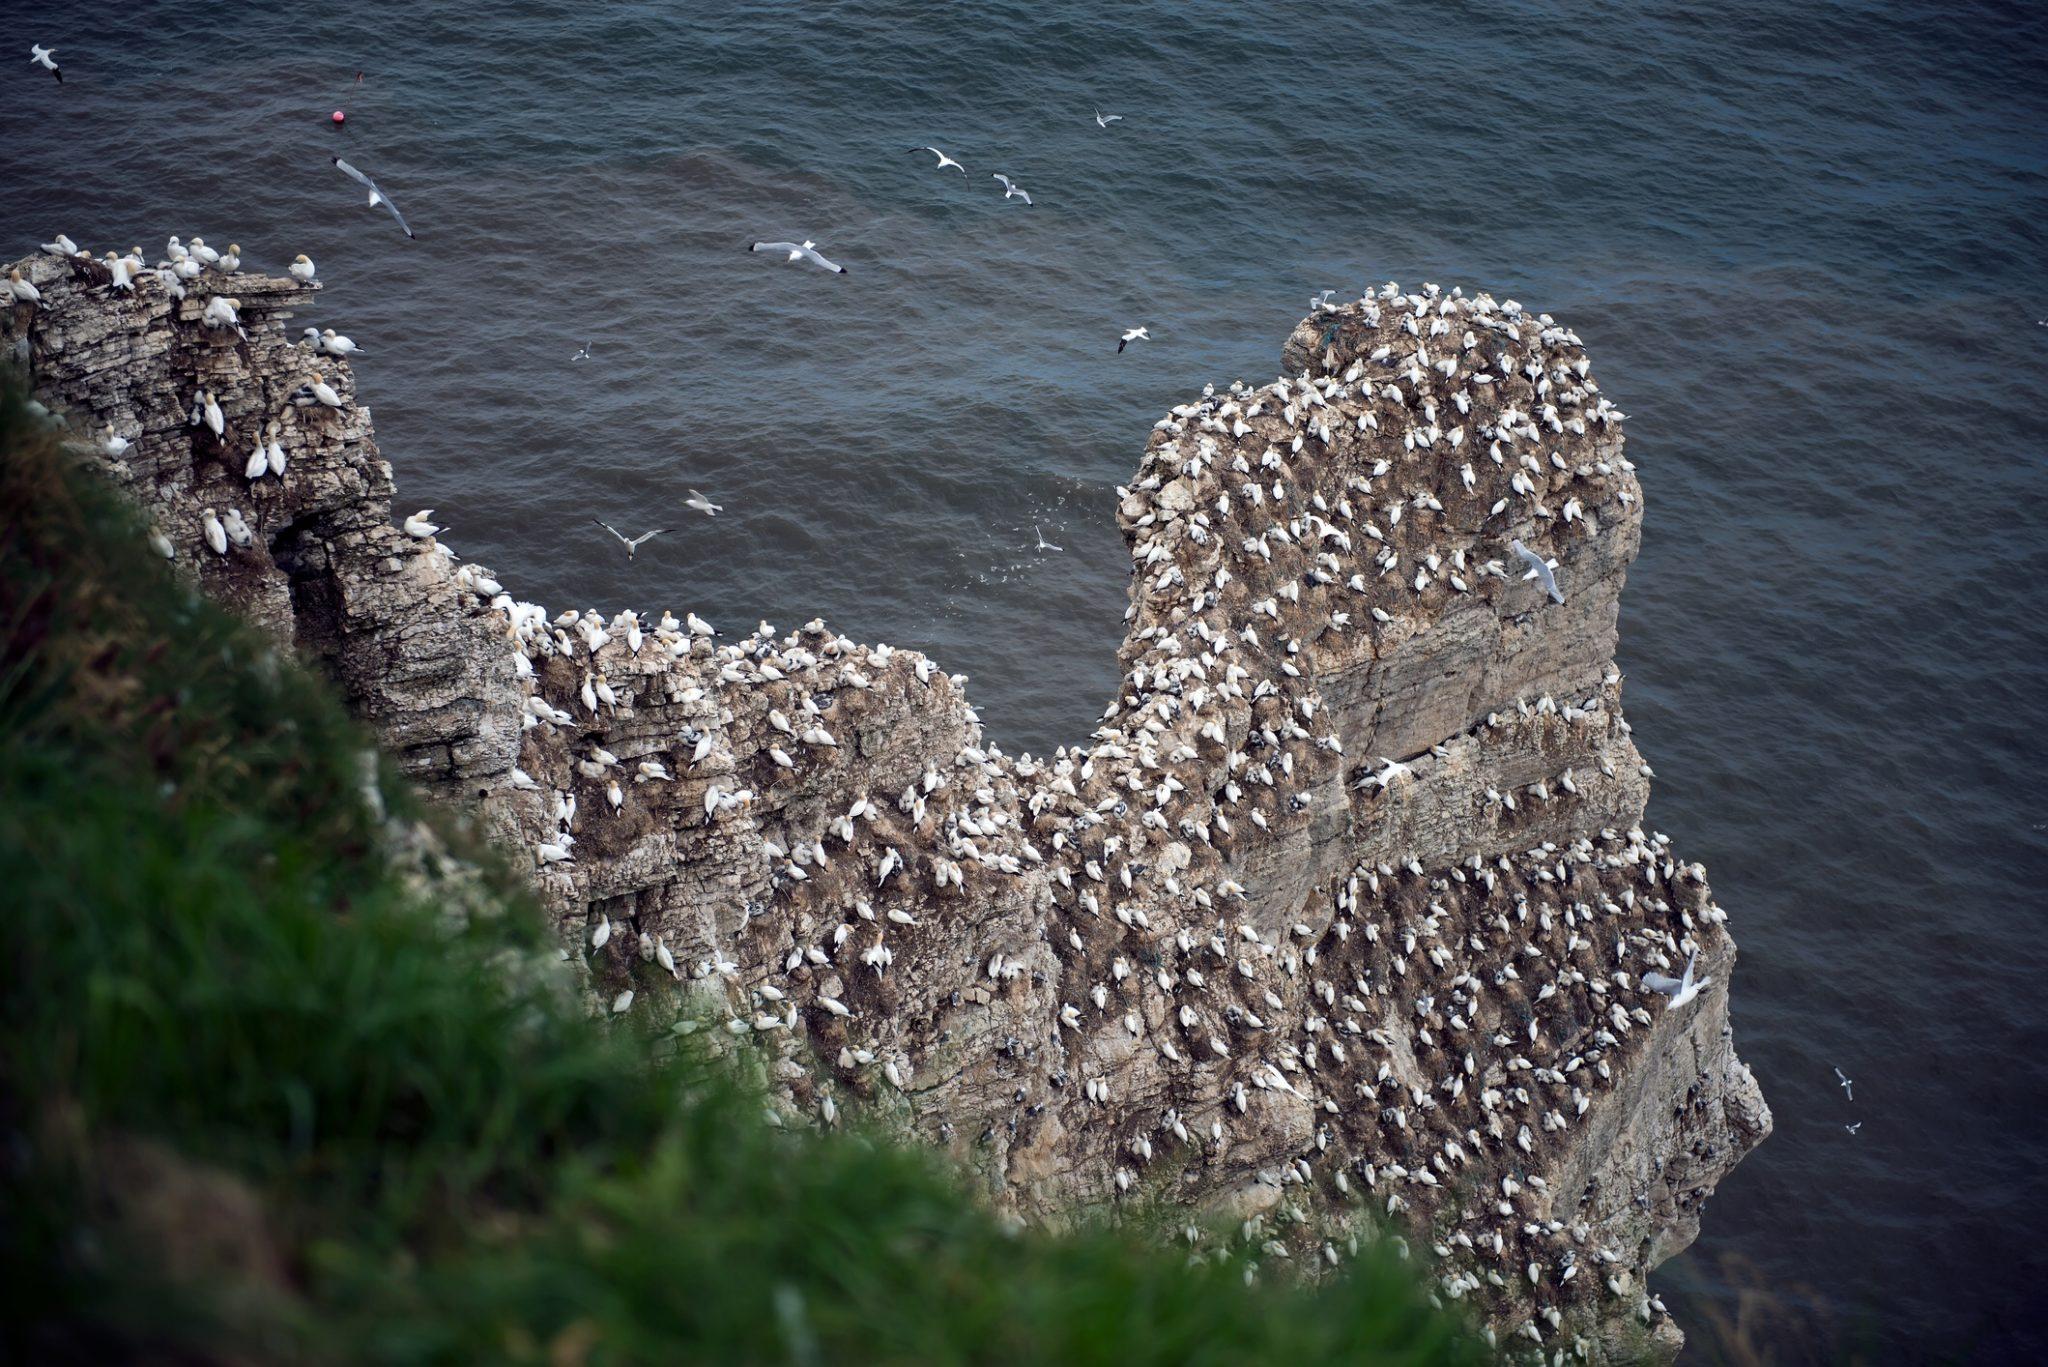 Gannets at Bempton Cliffs RSPB reserve, Yorkshire.